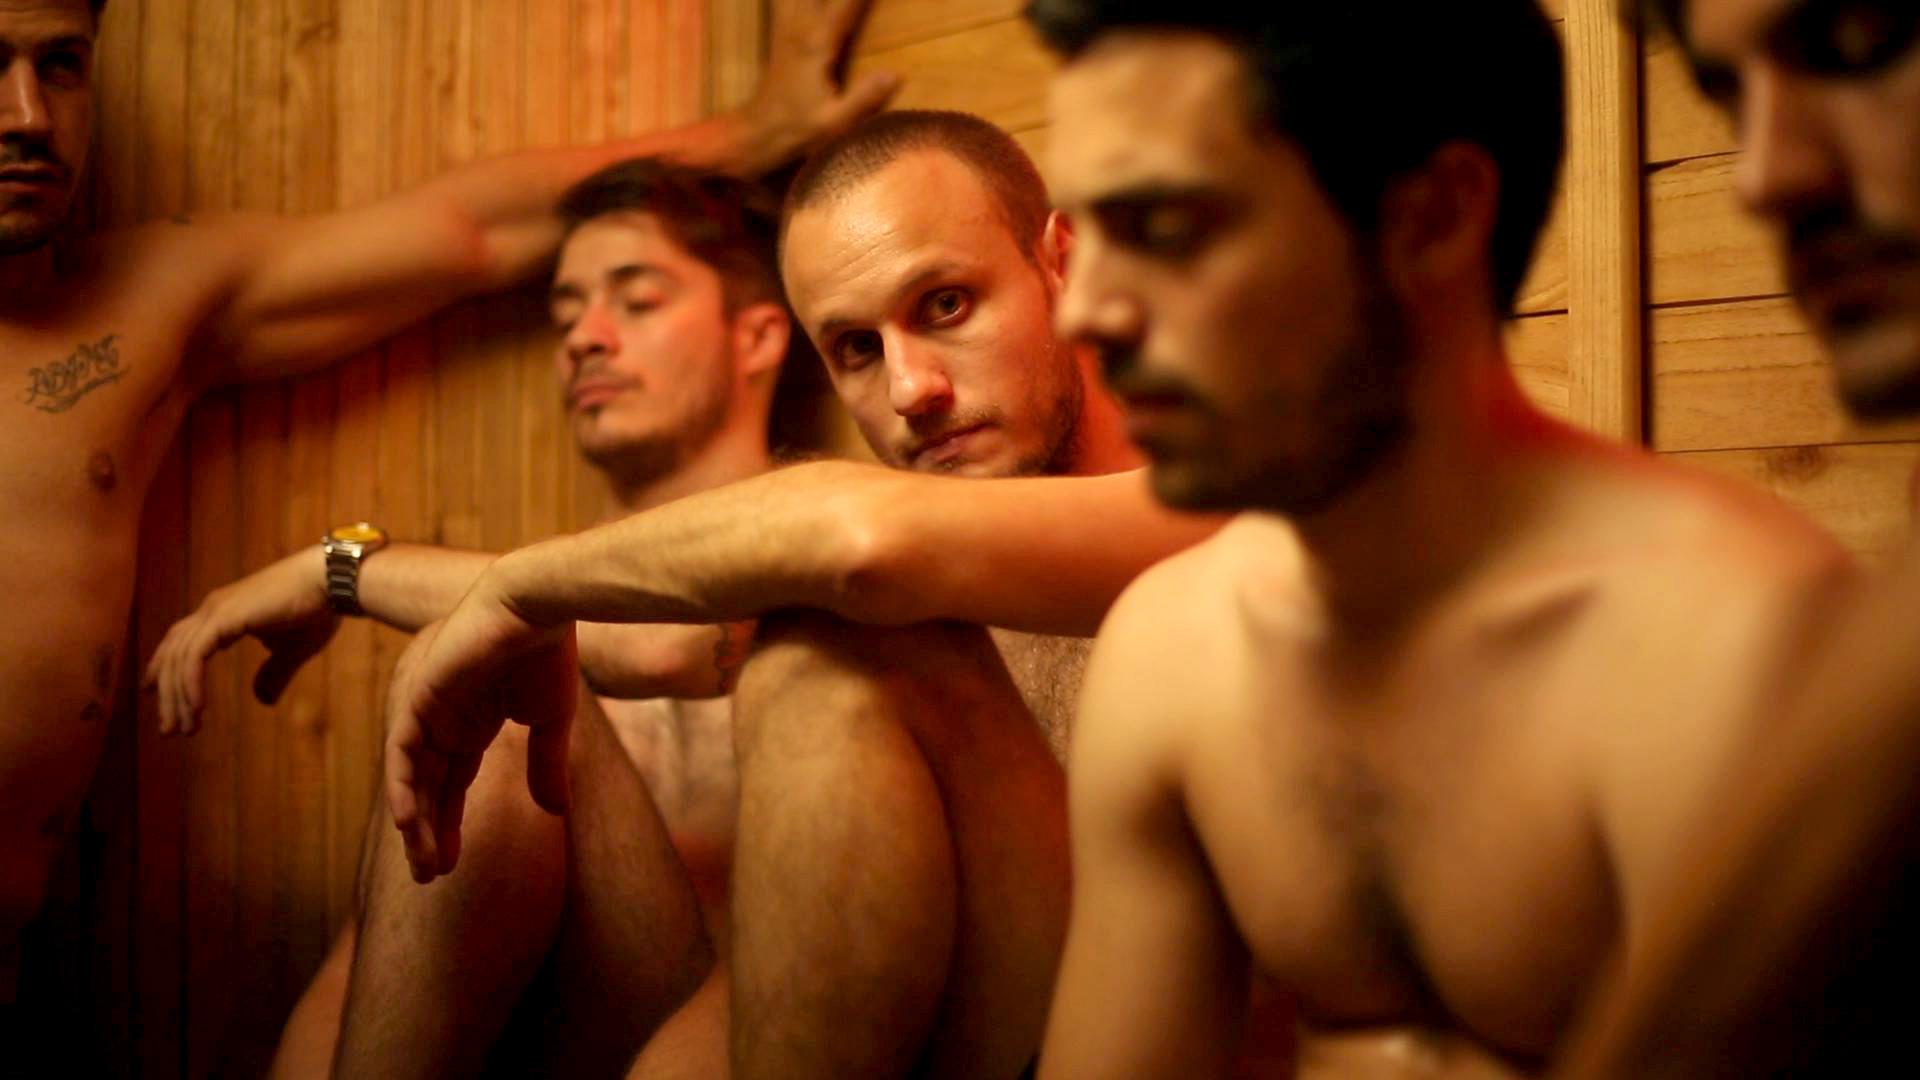 erotic homo massage argentina chatroulette danmark